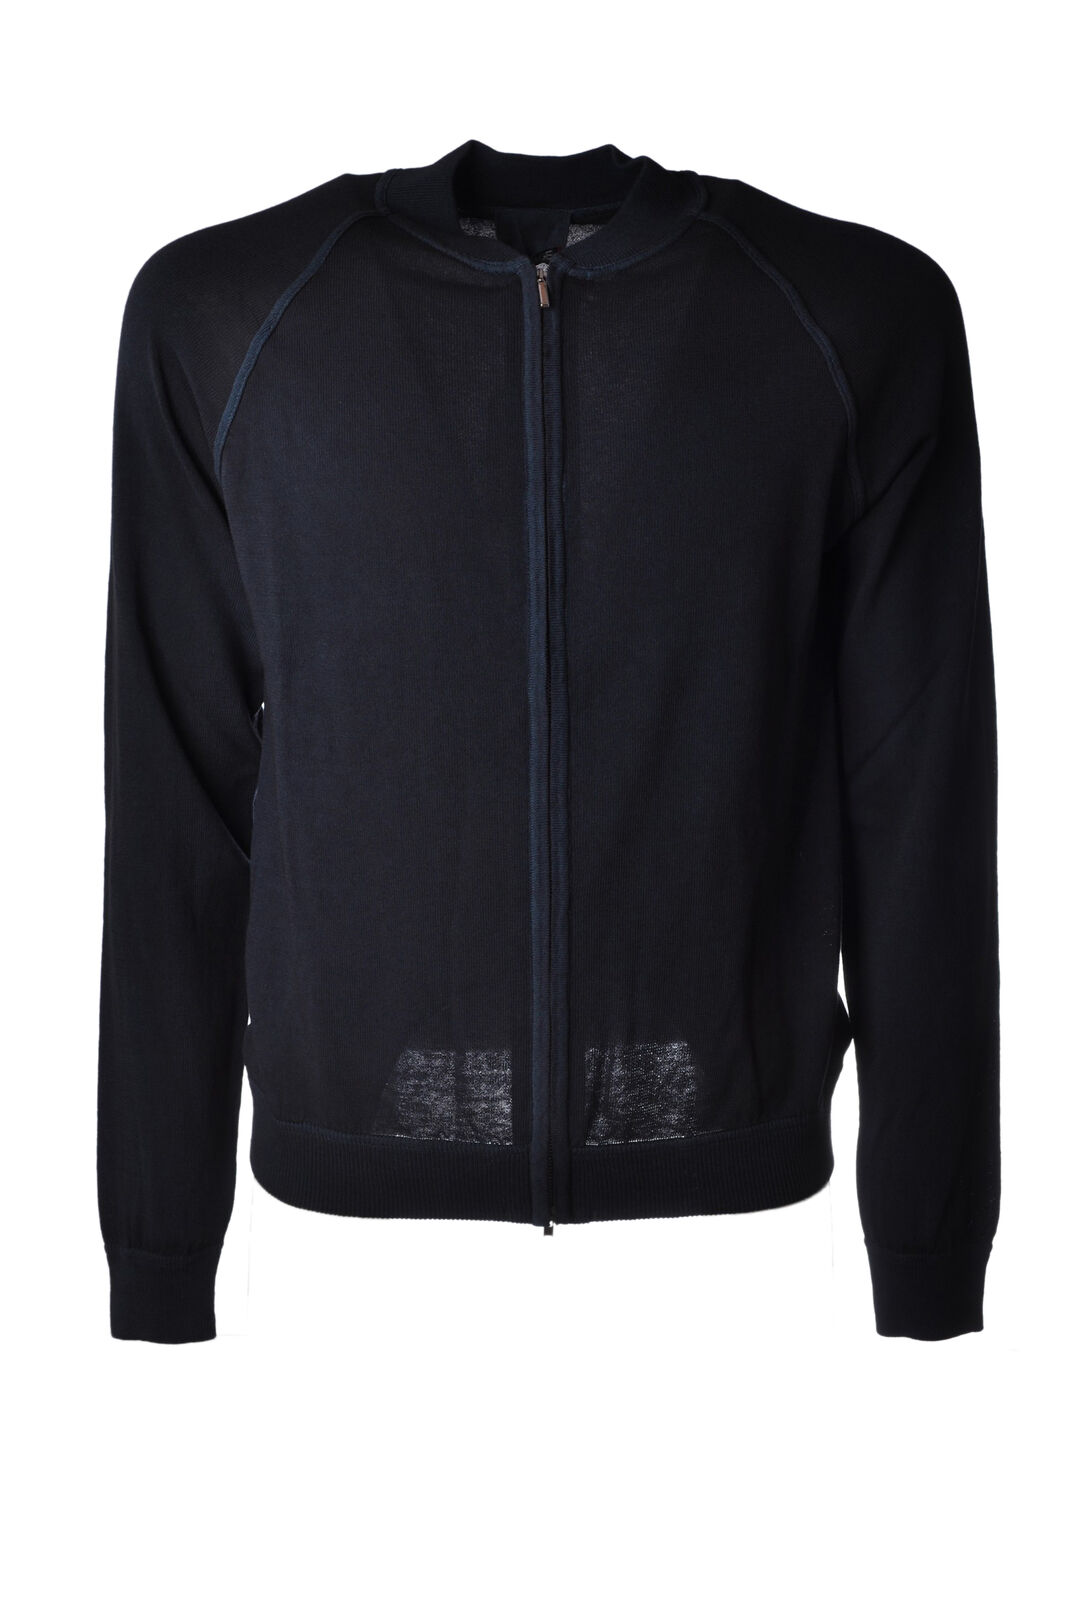 Heritage - Knitwear-Cardigan - Man - bluee - 5022415G184321